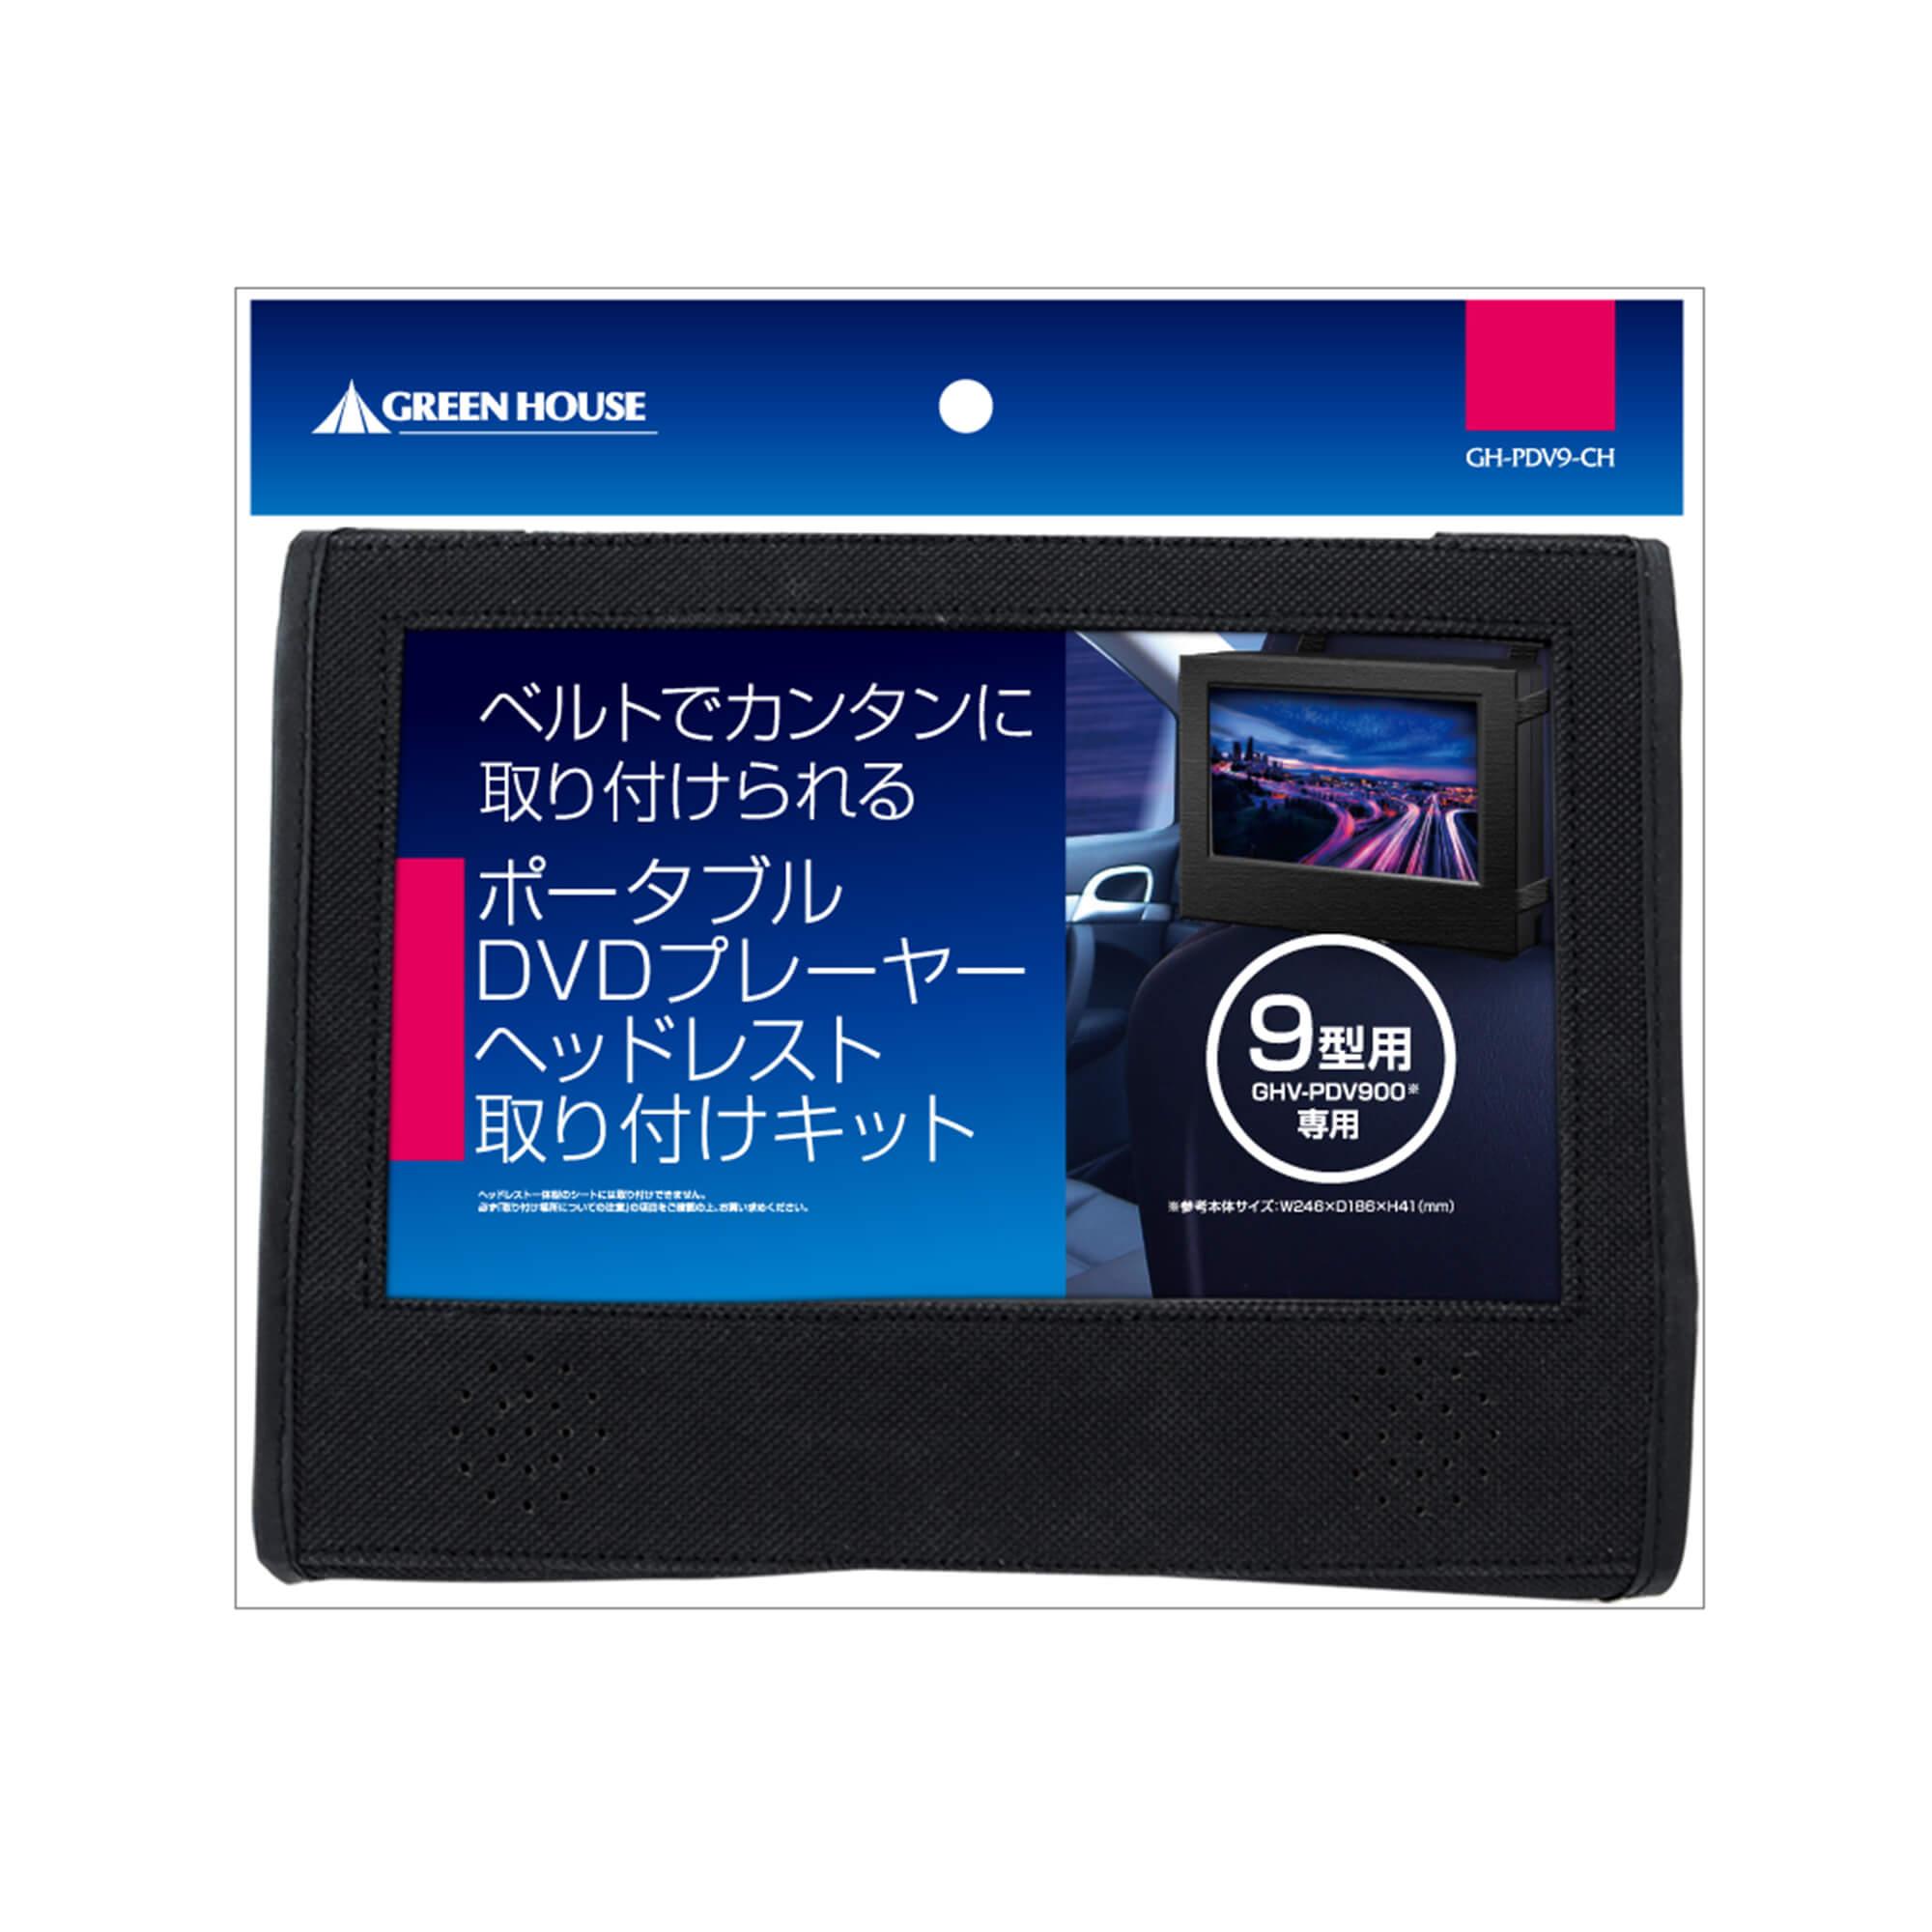 GH-PDV*-CHシリーズ